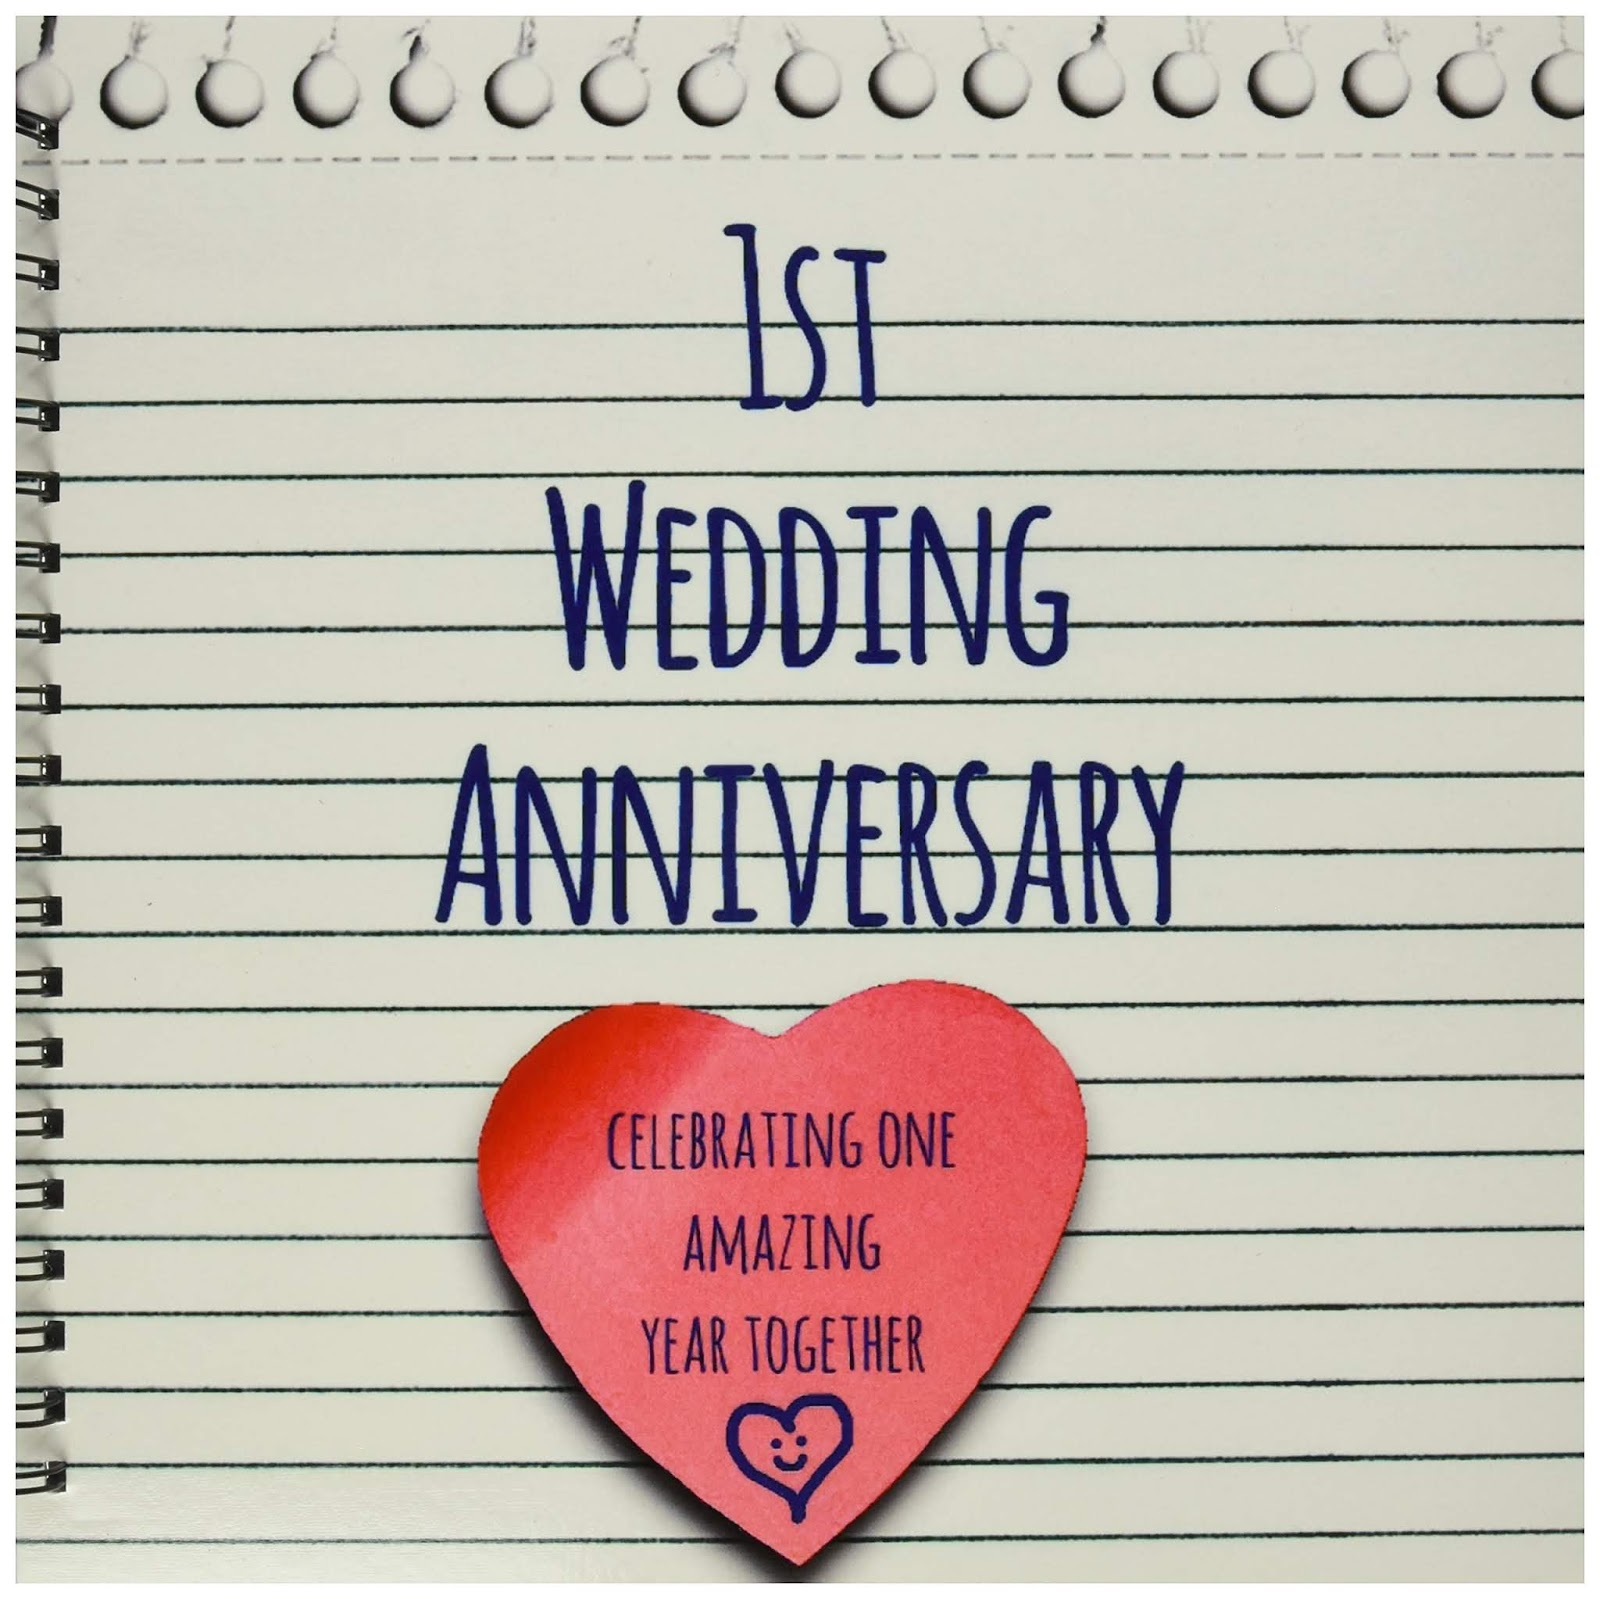 Ideas To Celebrate Wedding Anniversary: 1st Wedding Anniversary Celebration Ideas